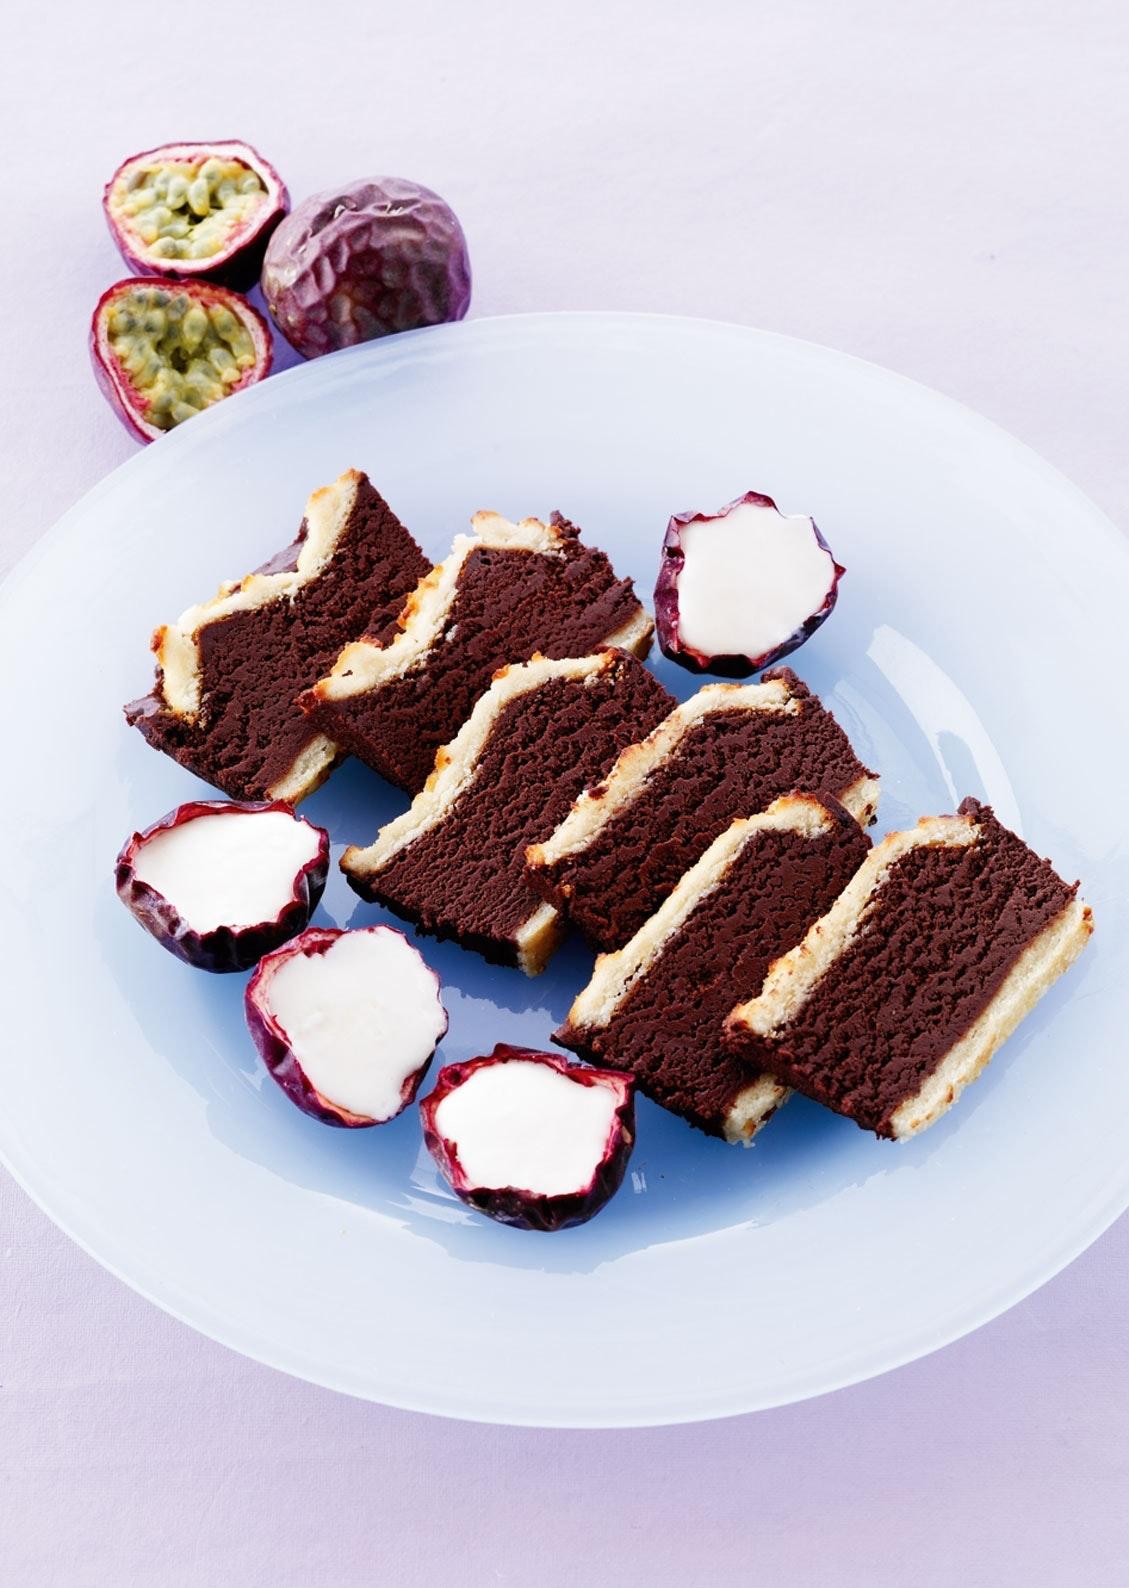 Middag: Chokoladecreme i marcipan med passionsfrugtis